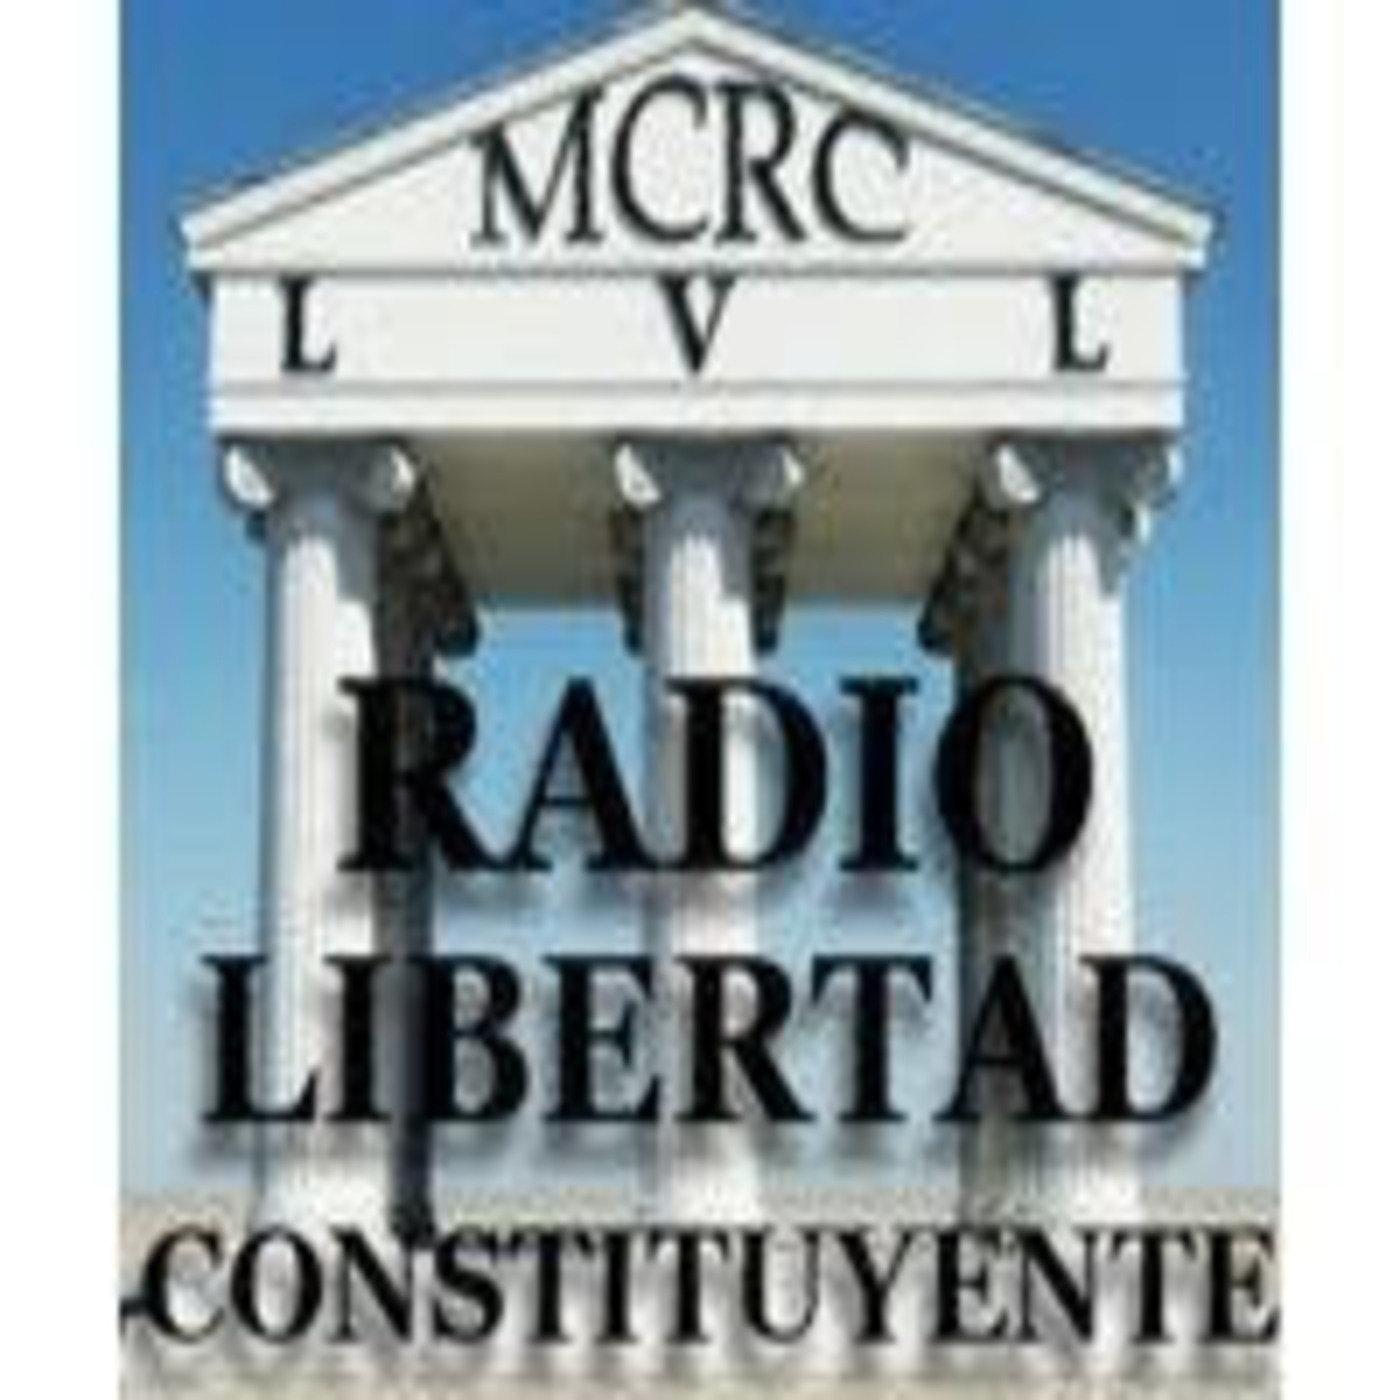 <![CDATA[Radio Libertad Constituyente]]>